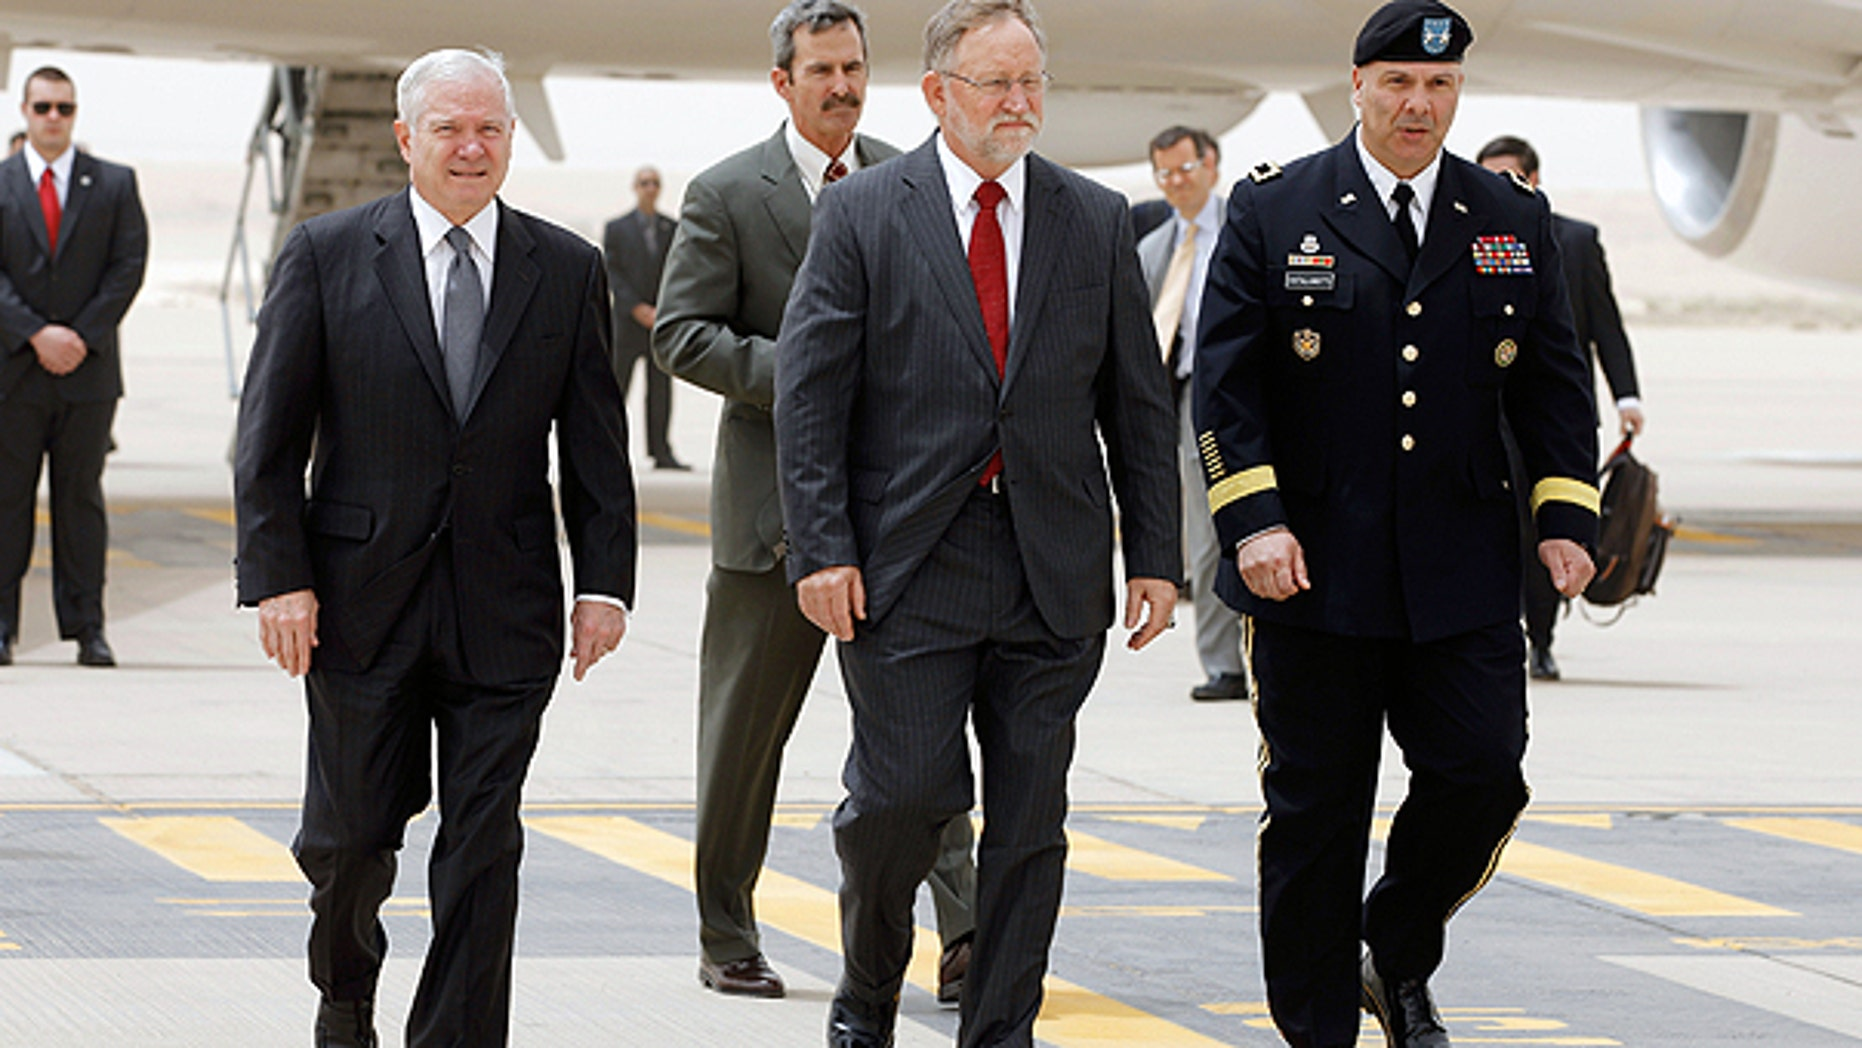 April 6: Defense Secretary Robert Gates, left, U.S. Ambassador to Saudi Arabia James Smith, center, and Maj. Gen. Robert Catalanotti, right, walk across the tarmac in Riyadh, Saudi Arabia.